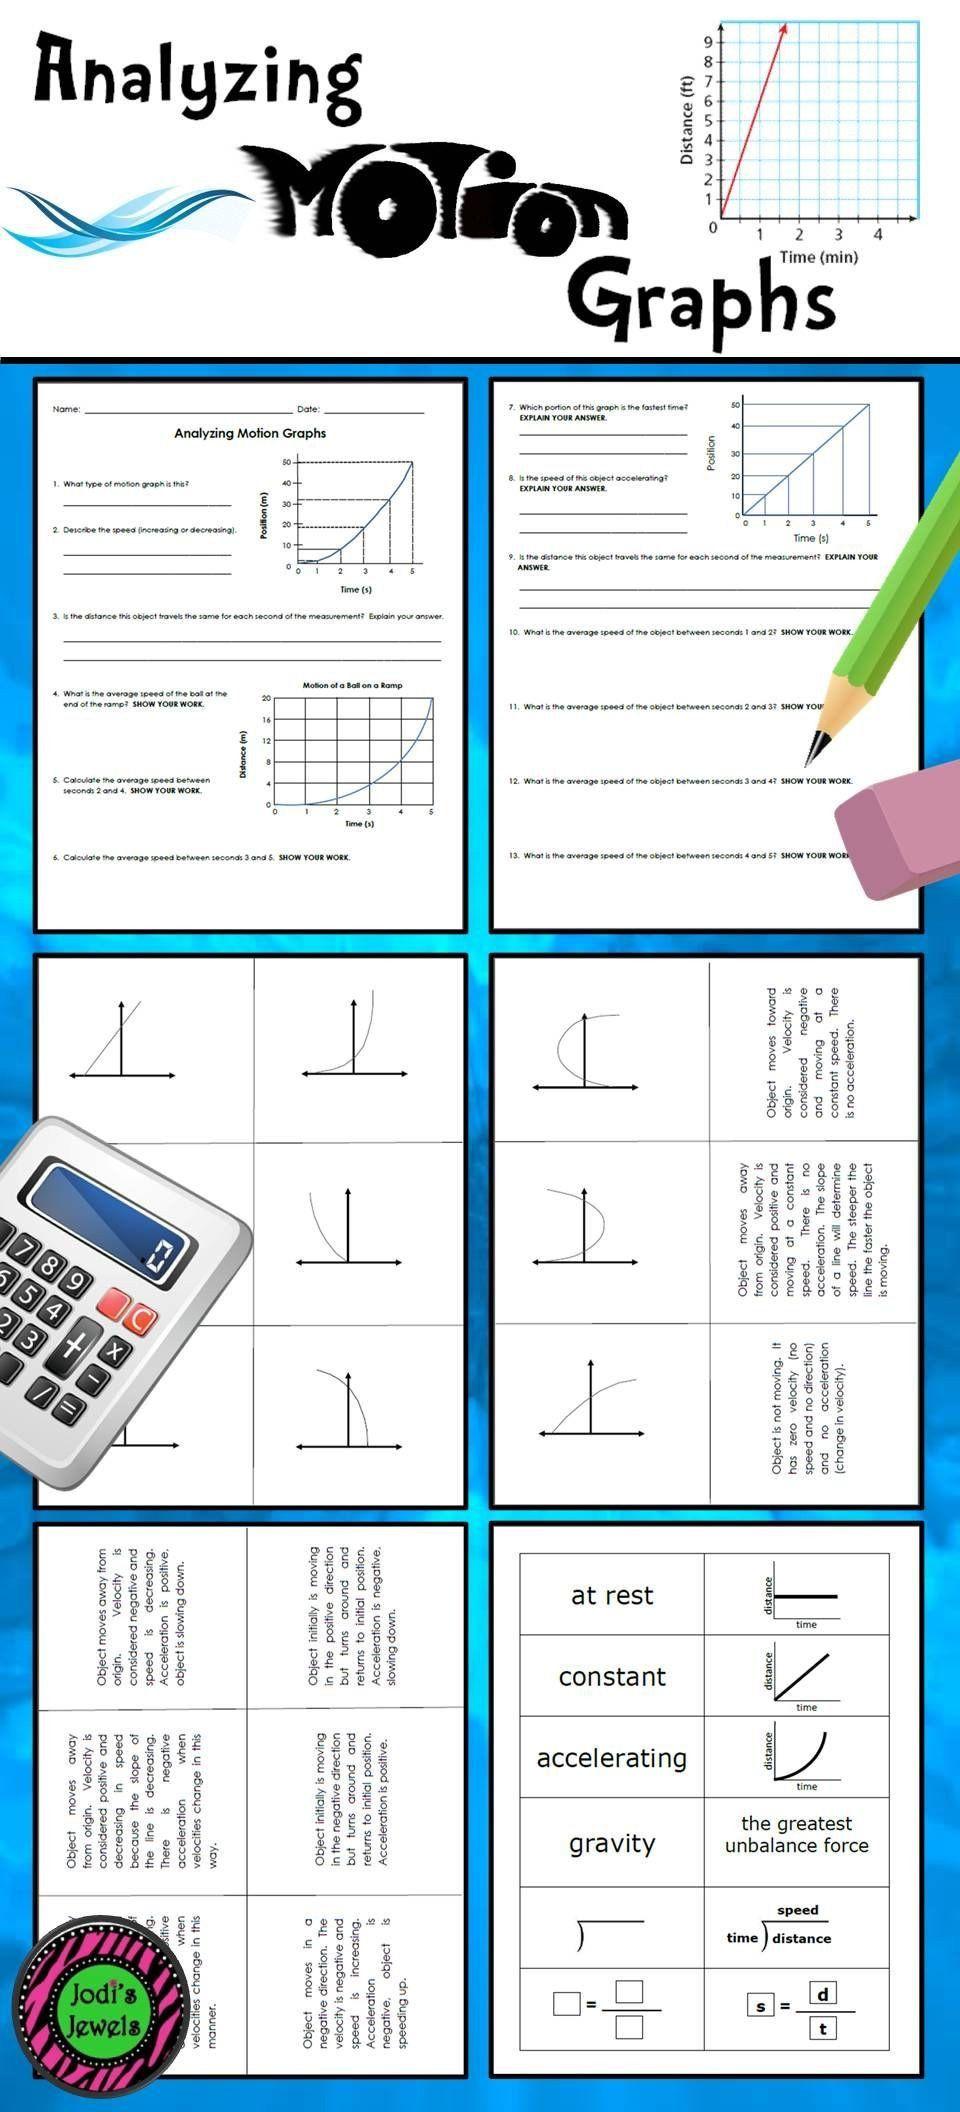 Motion Graphs Worksheet Answer Key Motion Graphs Worksheet Answer Key Students Will Practice